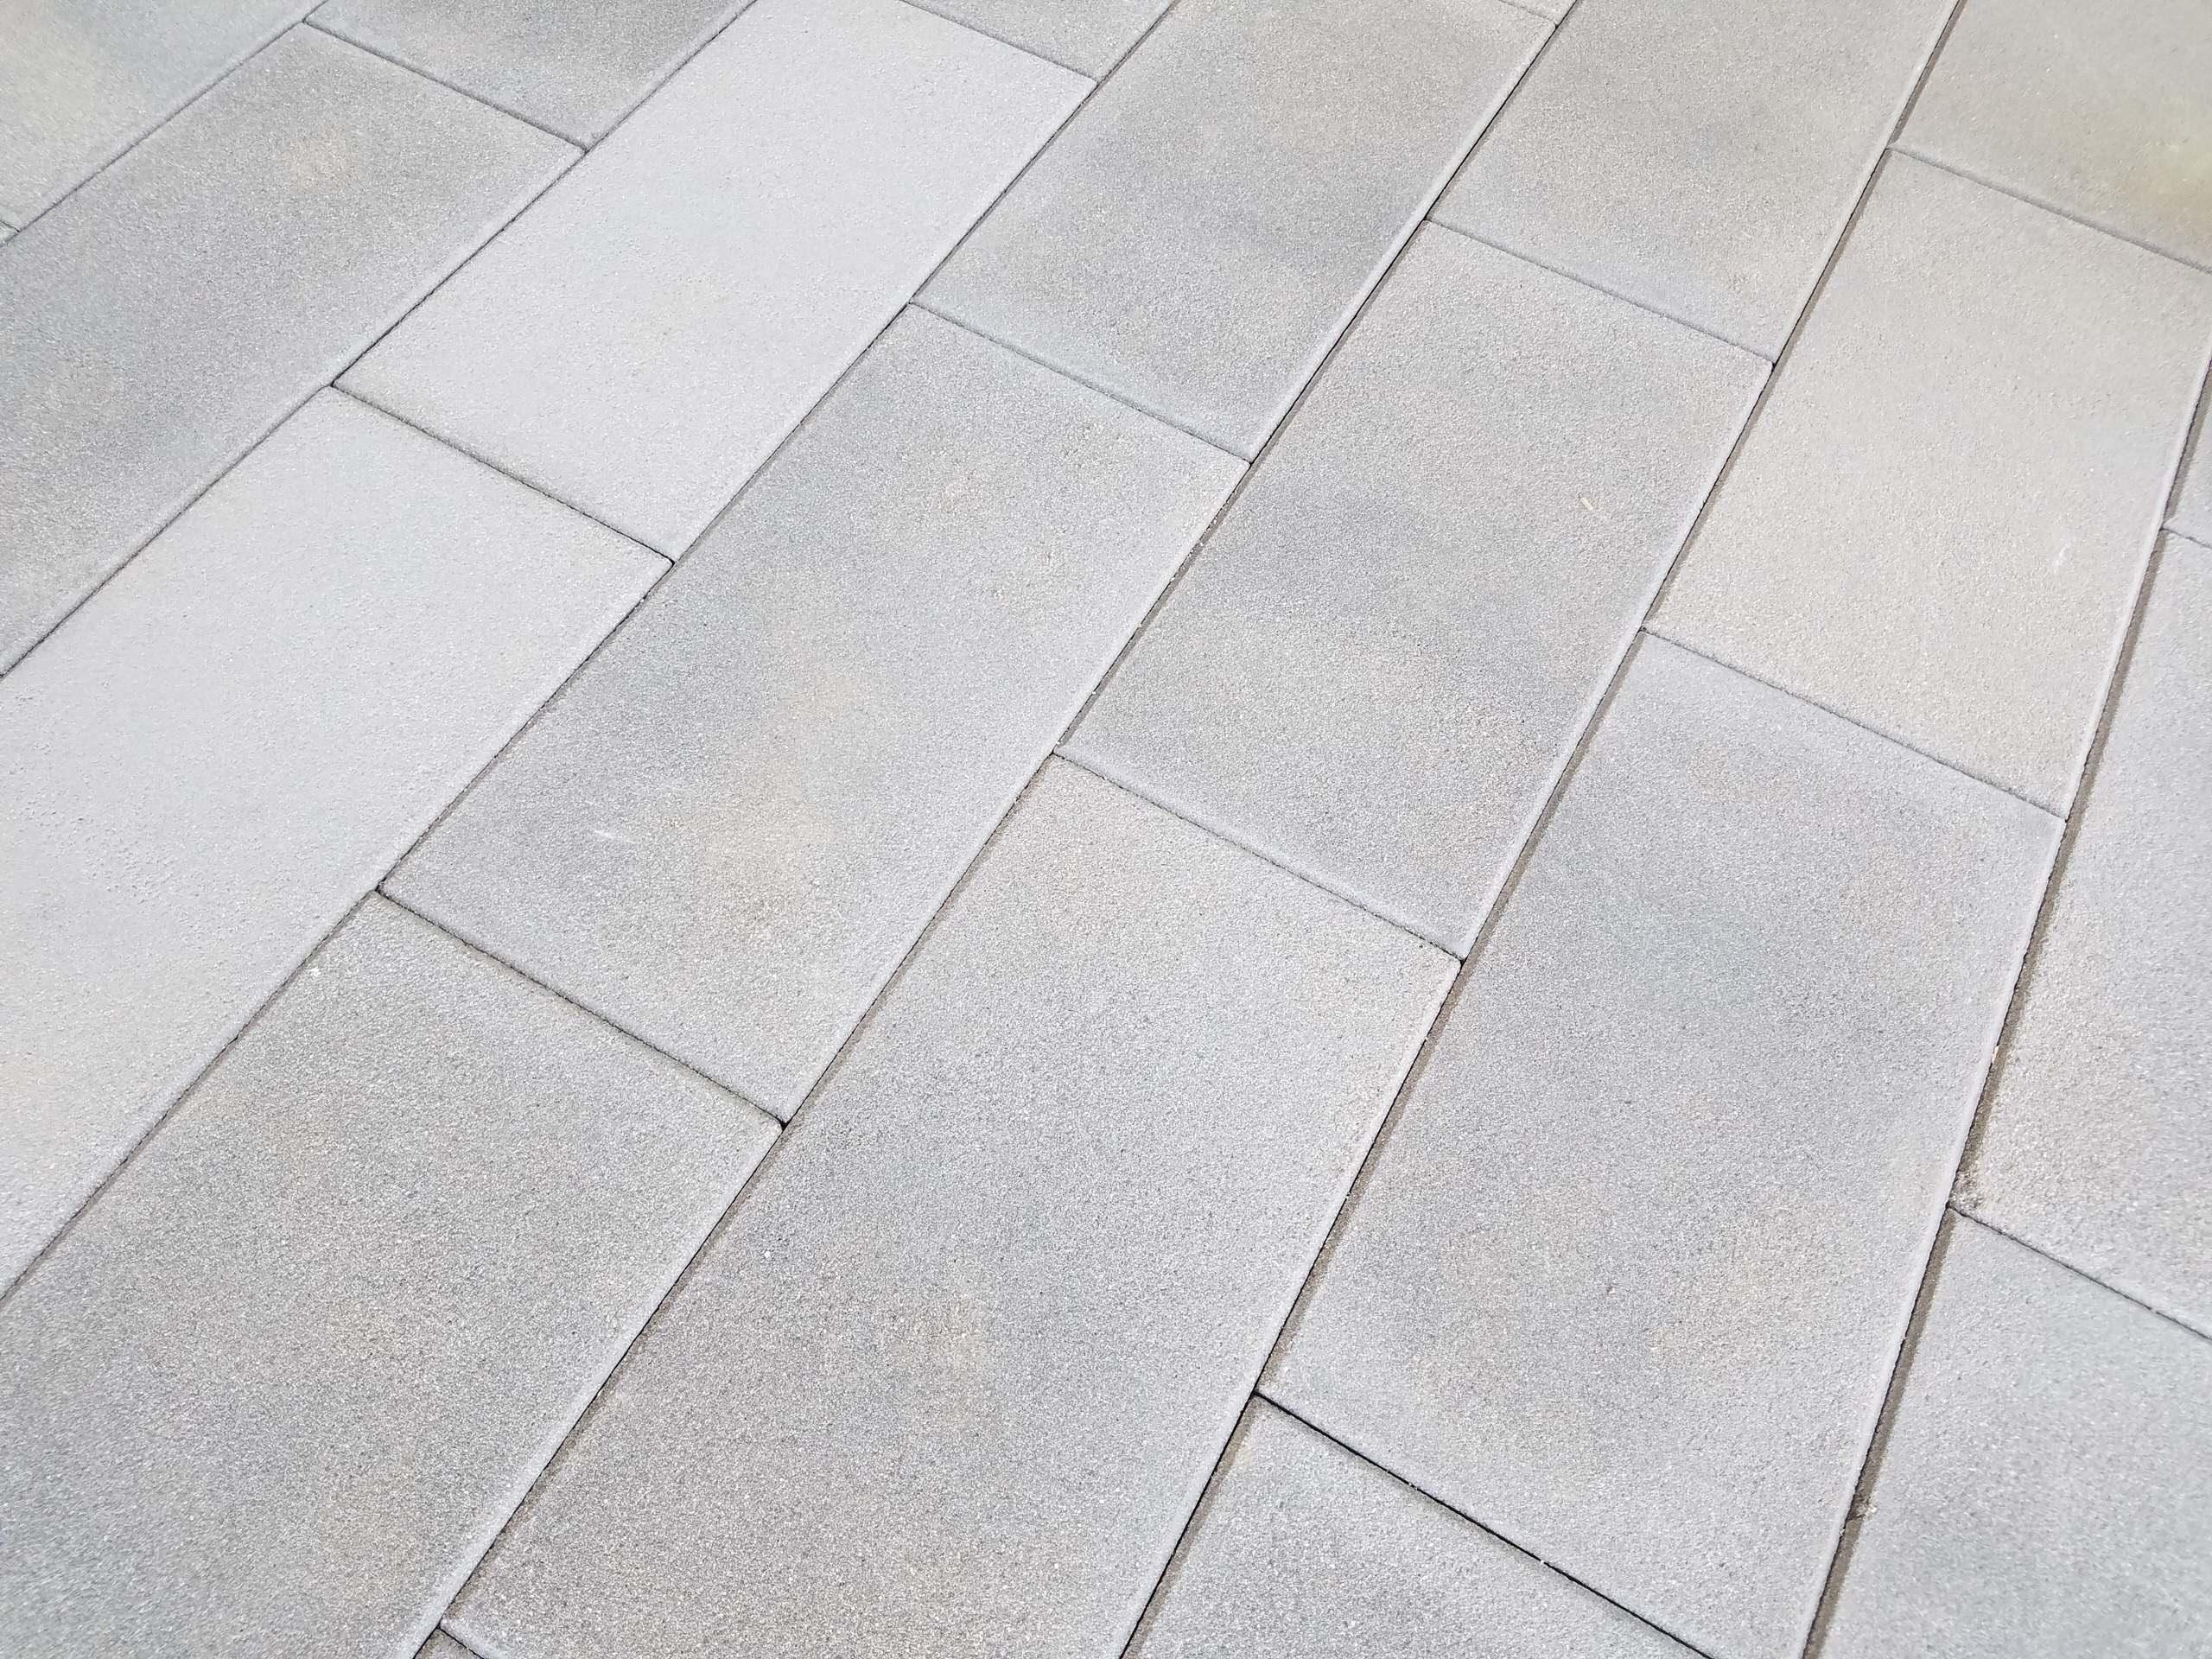 Acker Stone / Palazzo / Contempo Finish Pavers